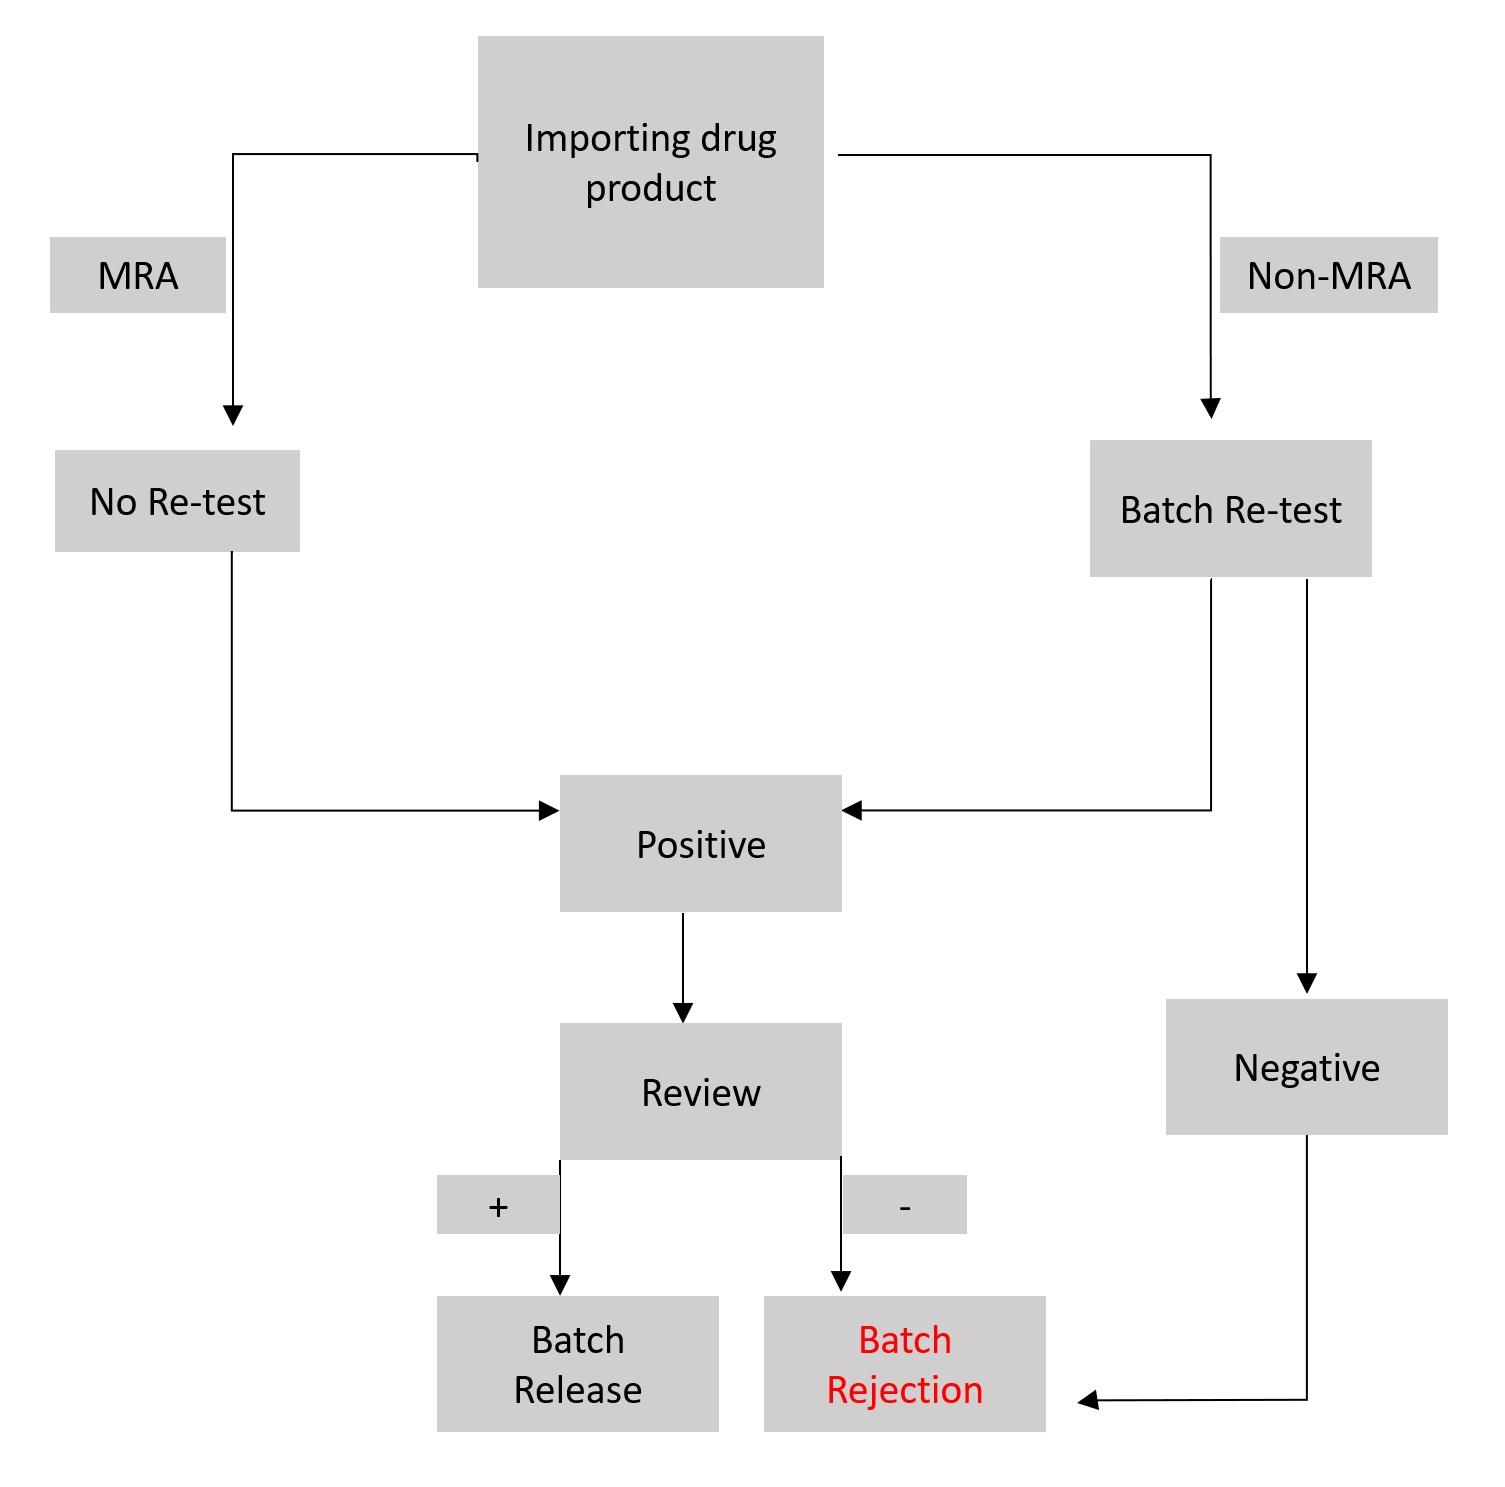 A drug's life